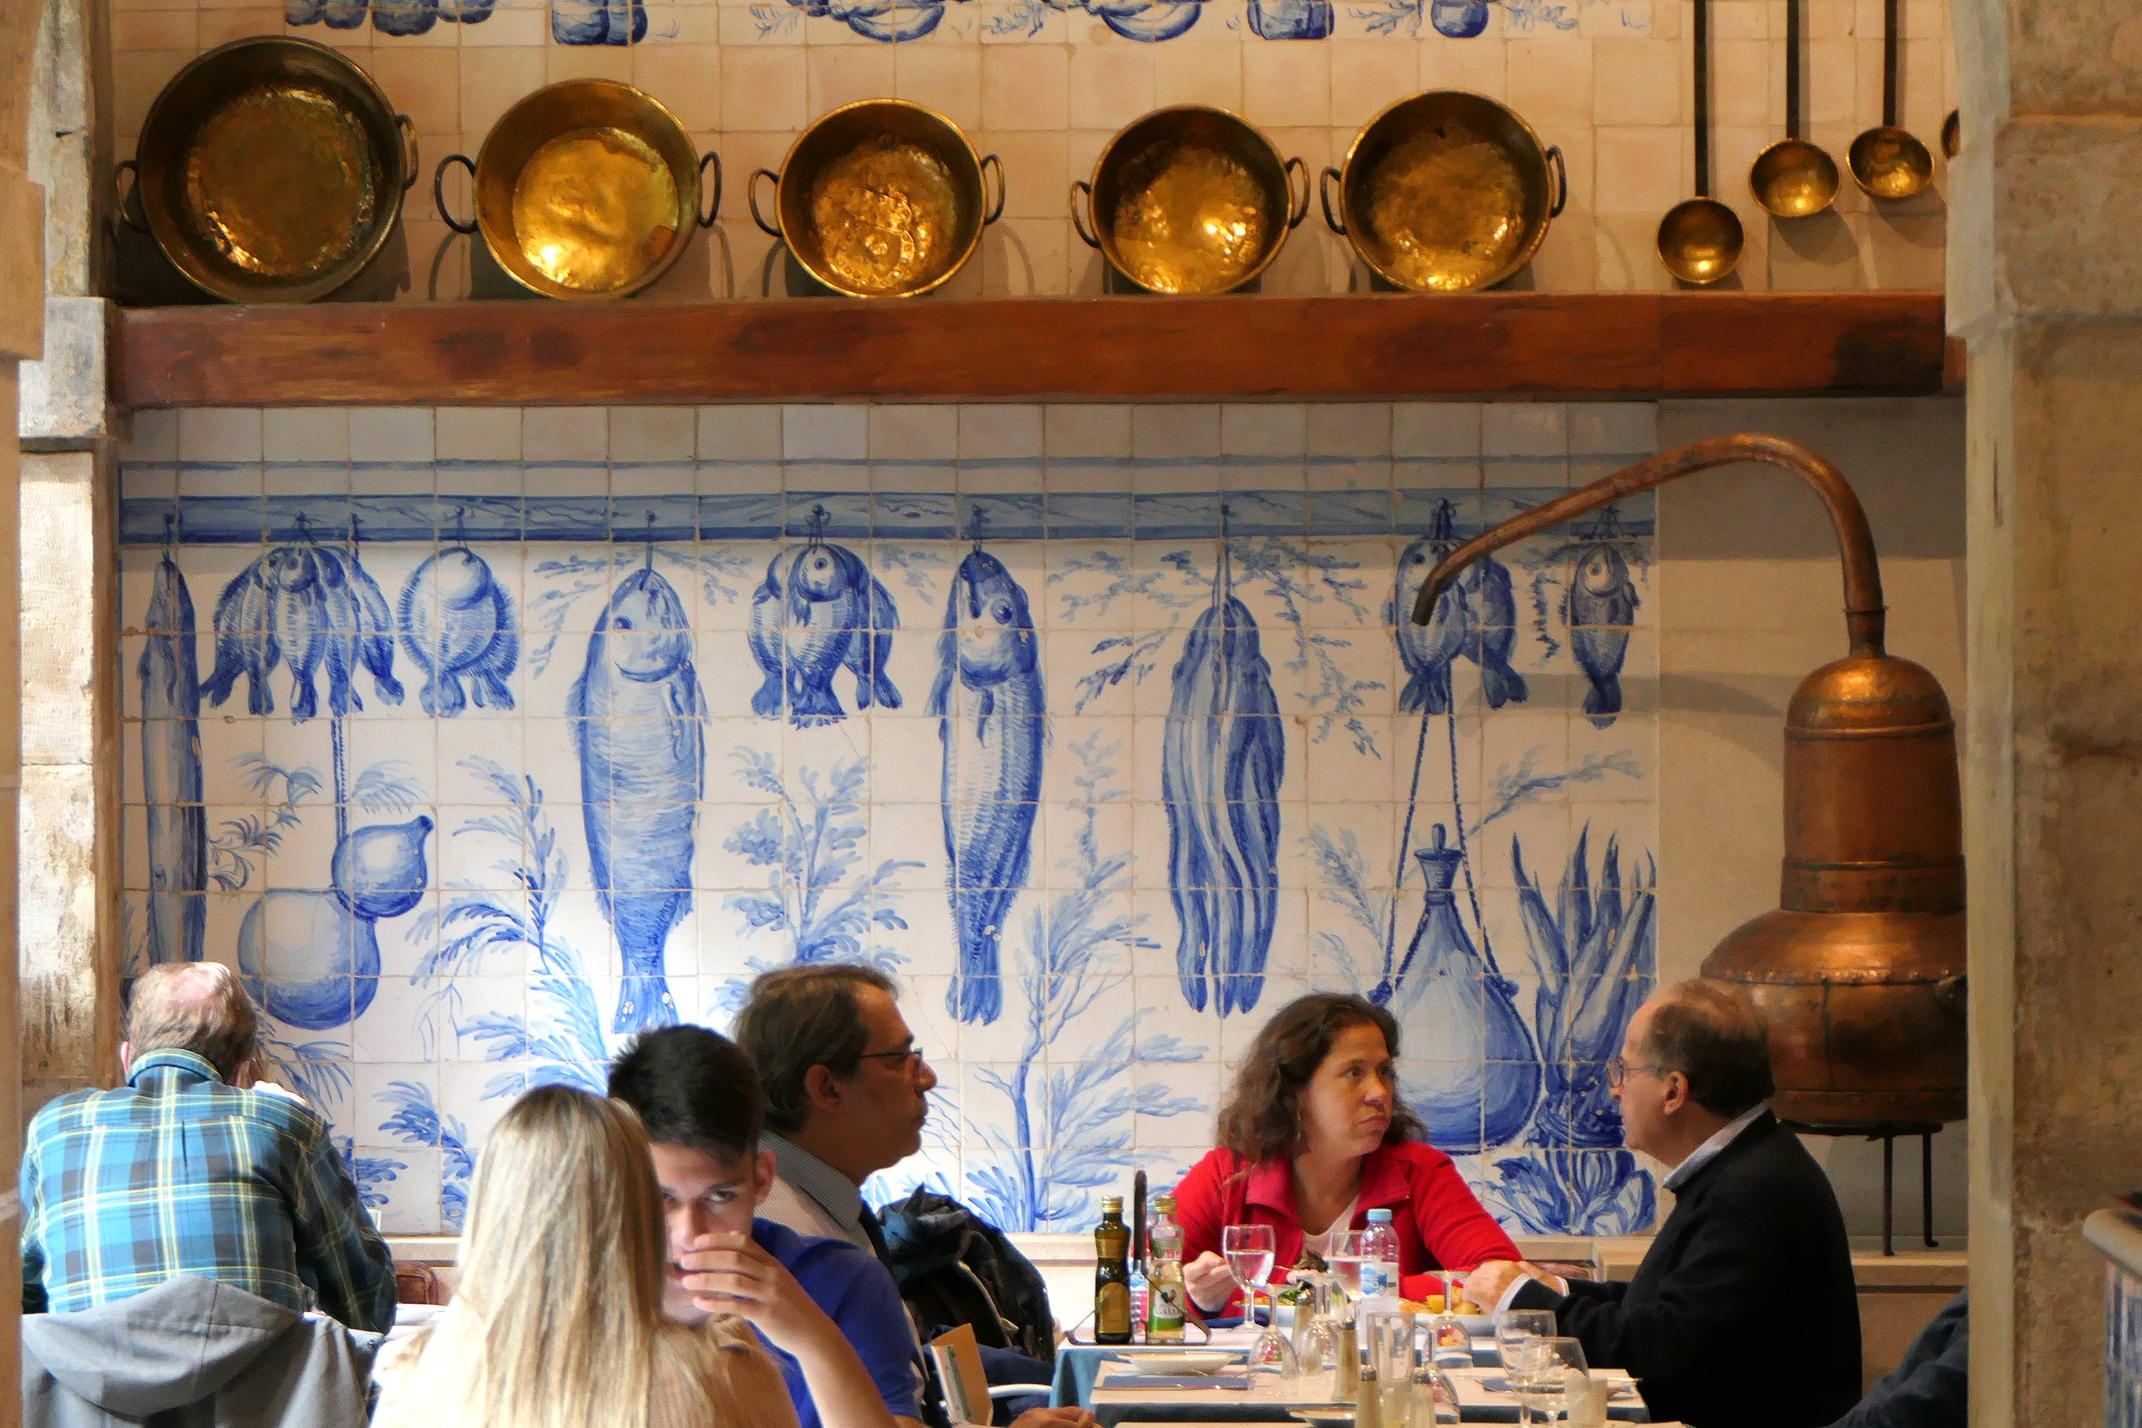 Portugal lisbon tile museum azulejo restaurant c diego